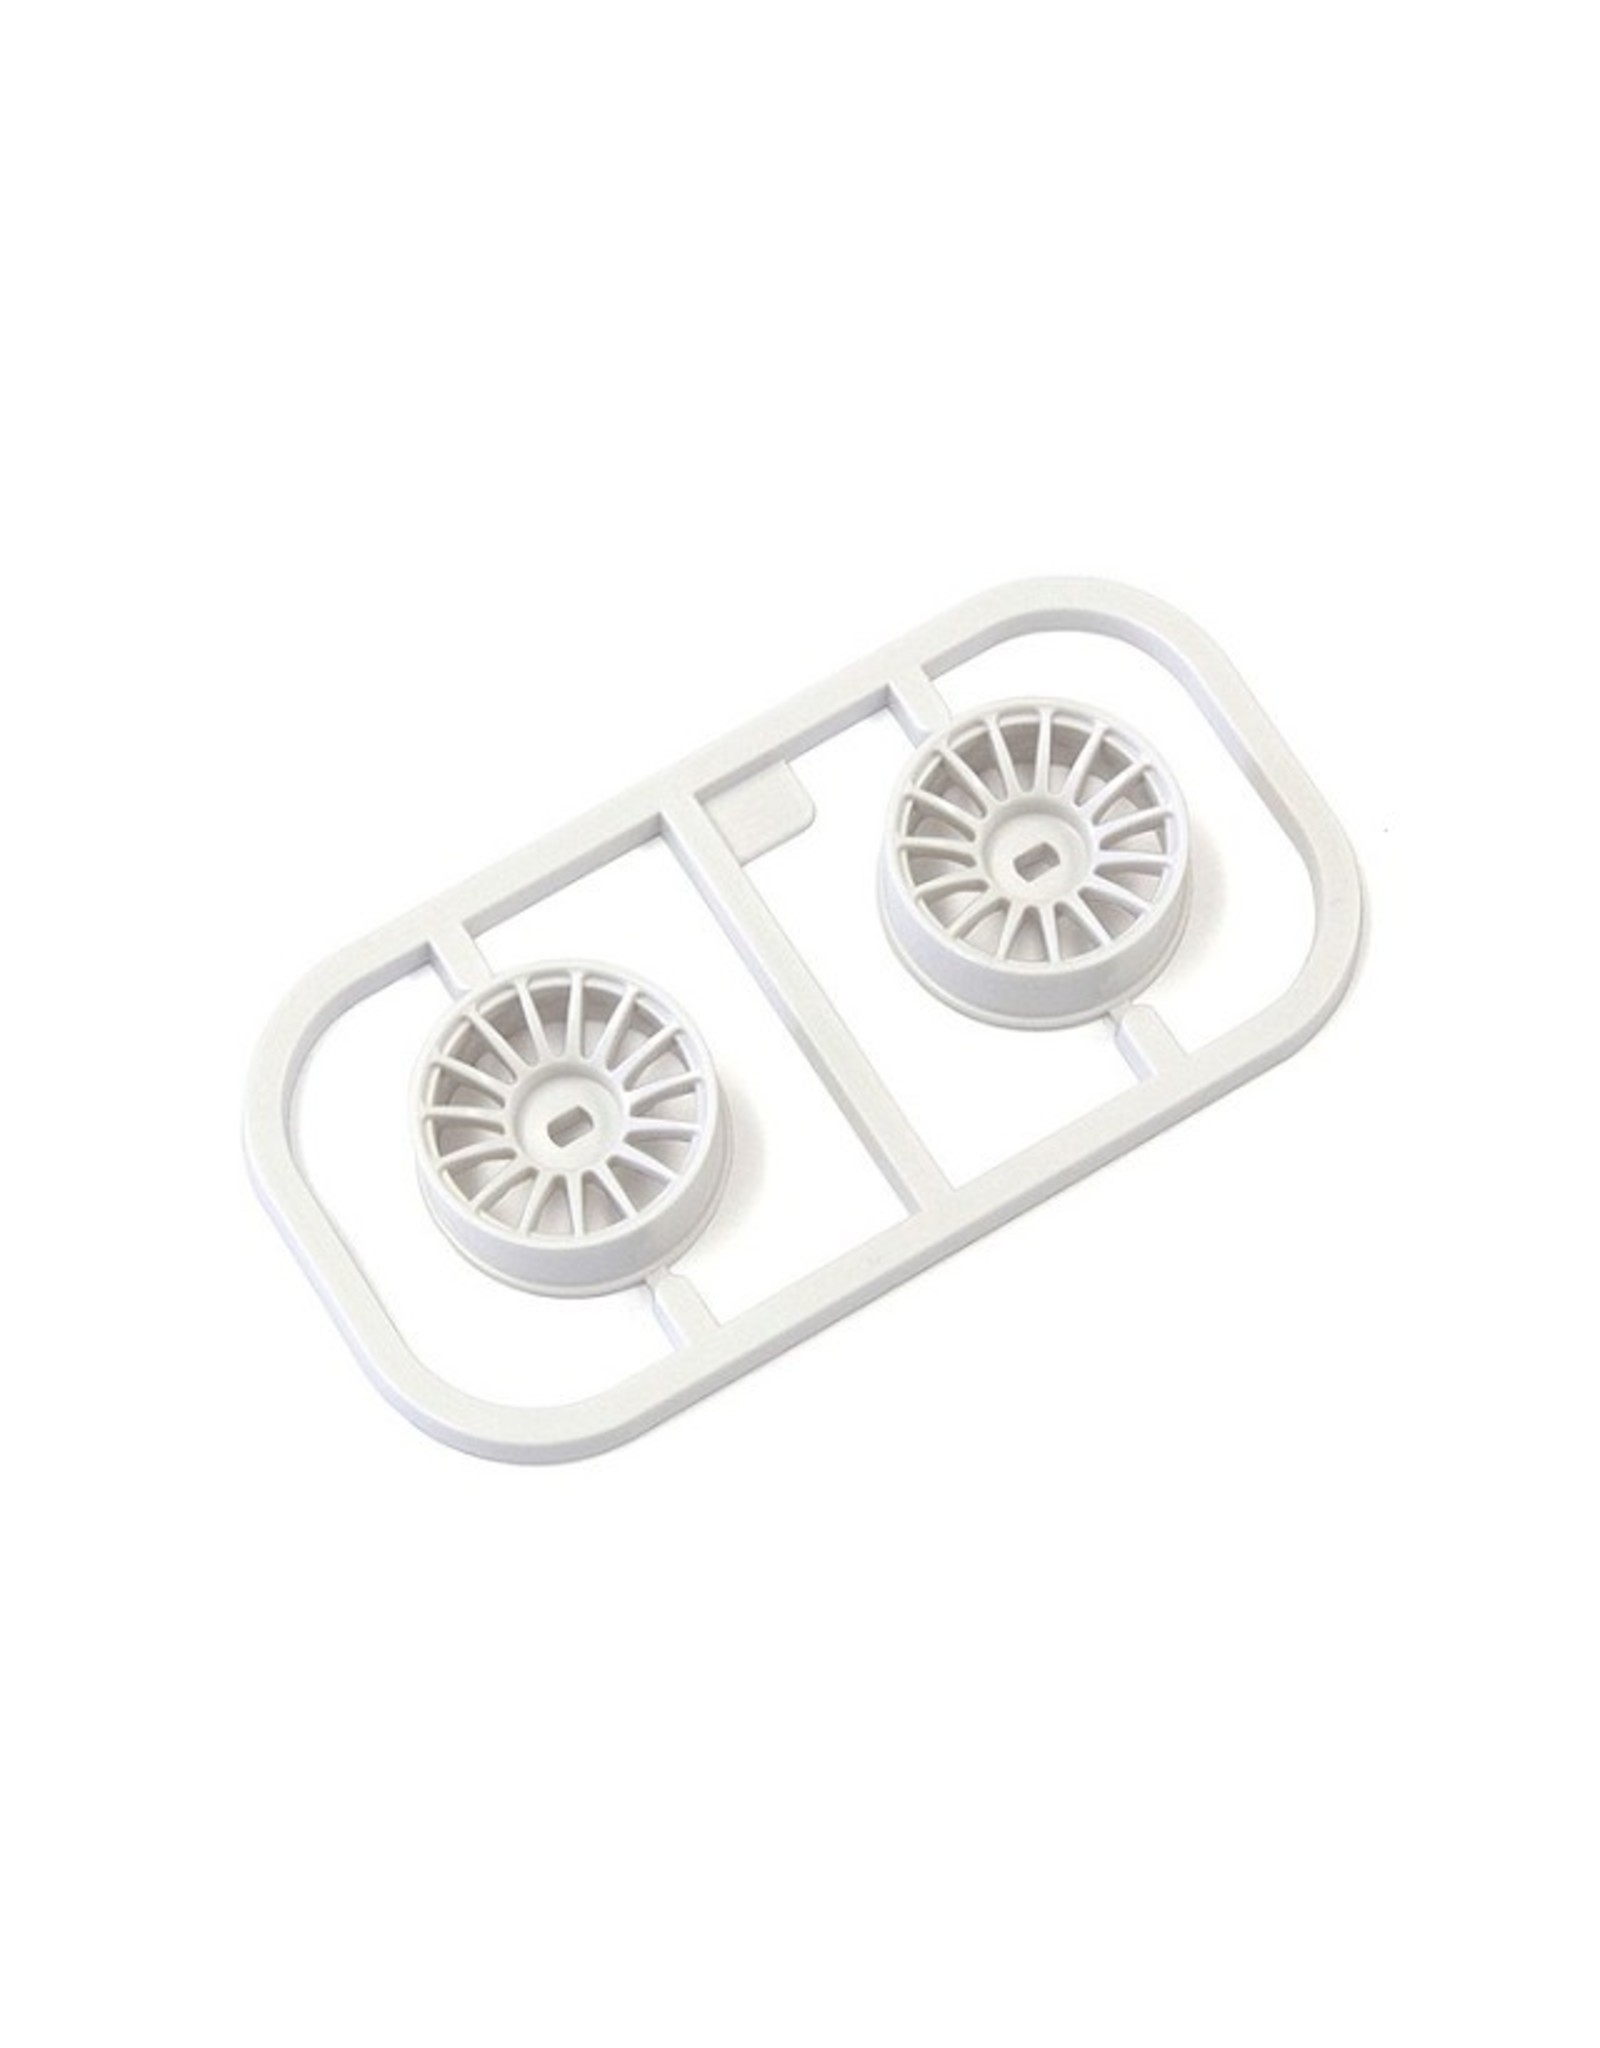 Kyosho Multi Wheel N/Offset 2.5 (White/AWD/2pcs.) (MDH100W-N25)